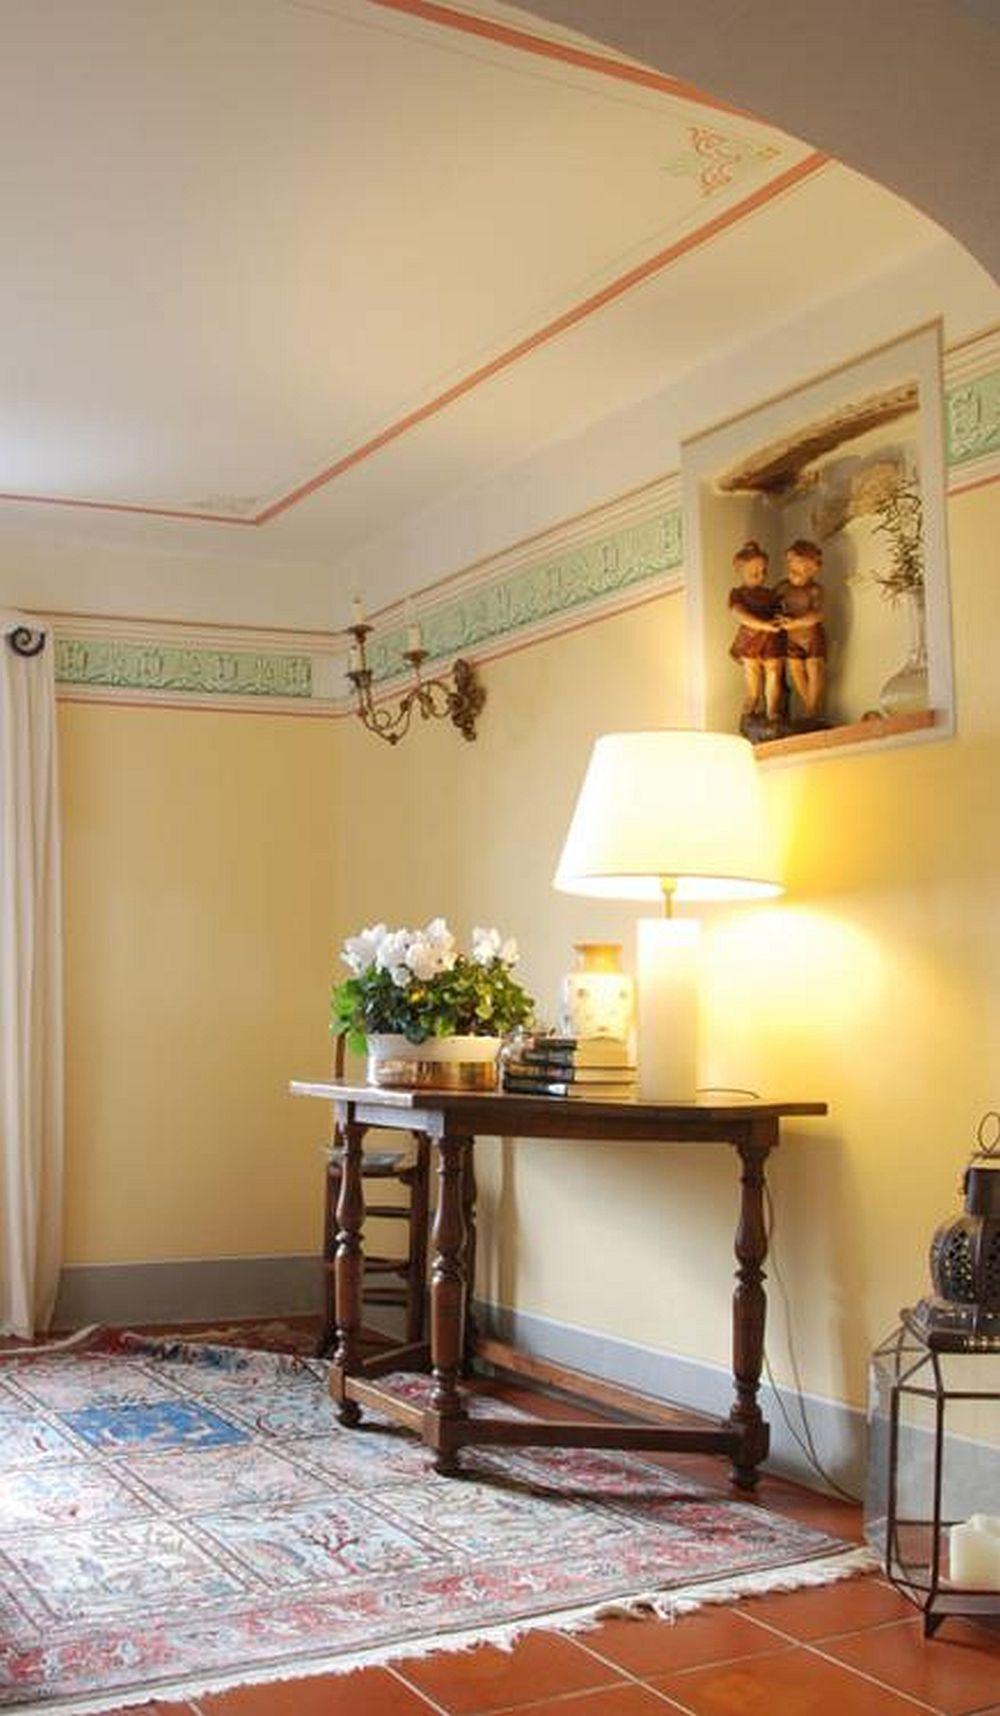 adelaparvu.com despre stilul toscan, casa in stil toscan, Villa Al Castello, Lucca, Italia (6)